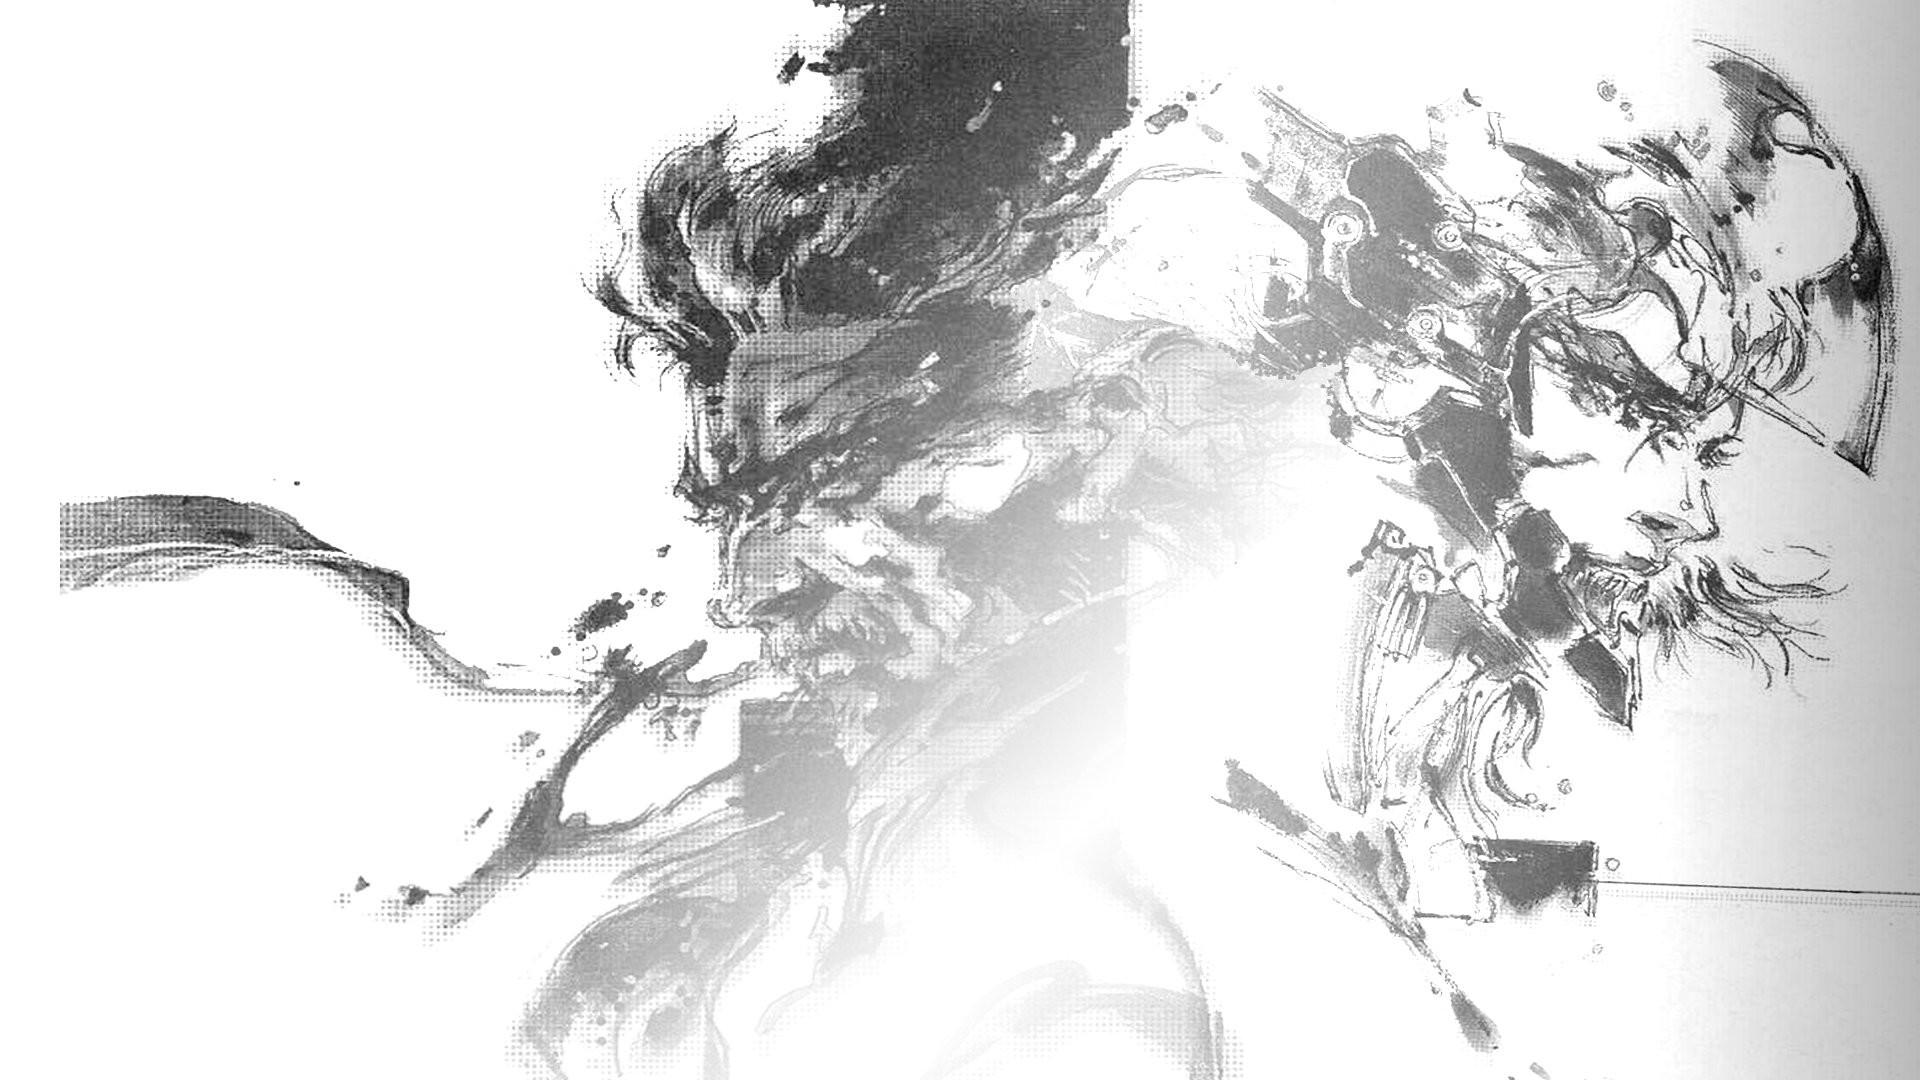 Metal Gear Solid 3 866264